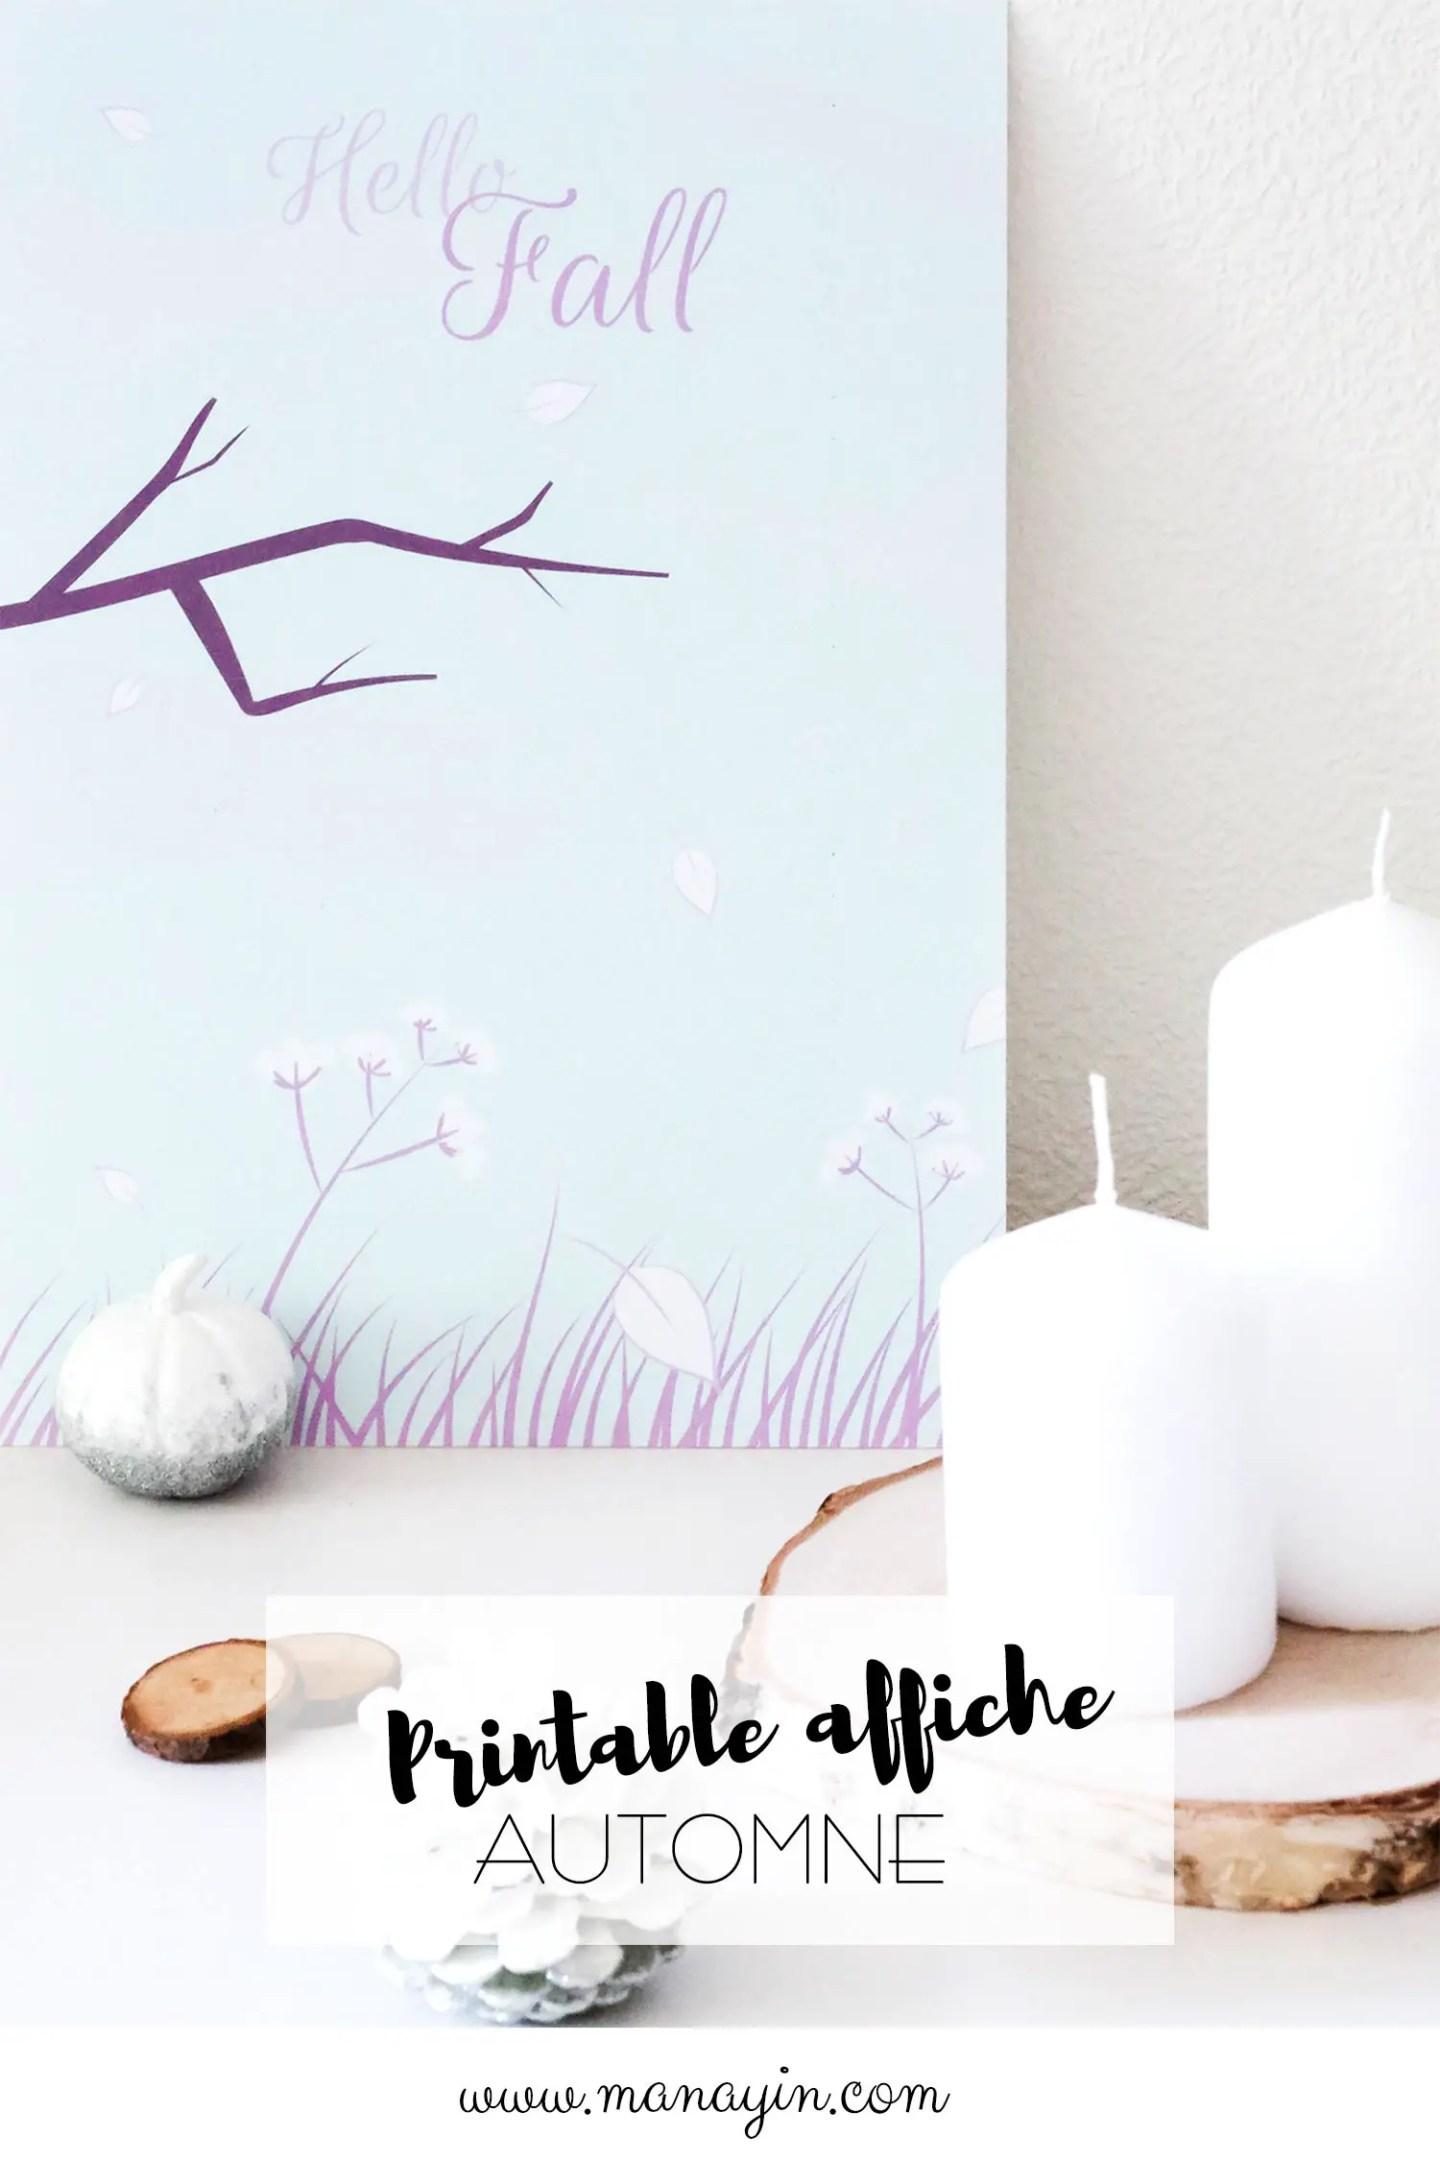 Affiche Automne - Printable